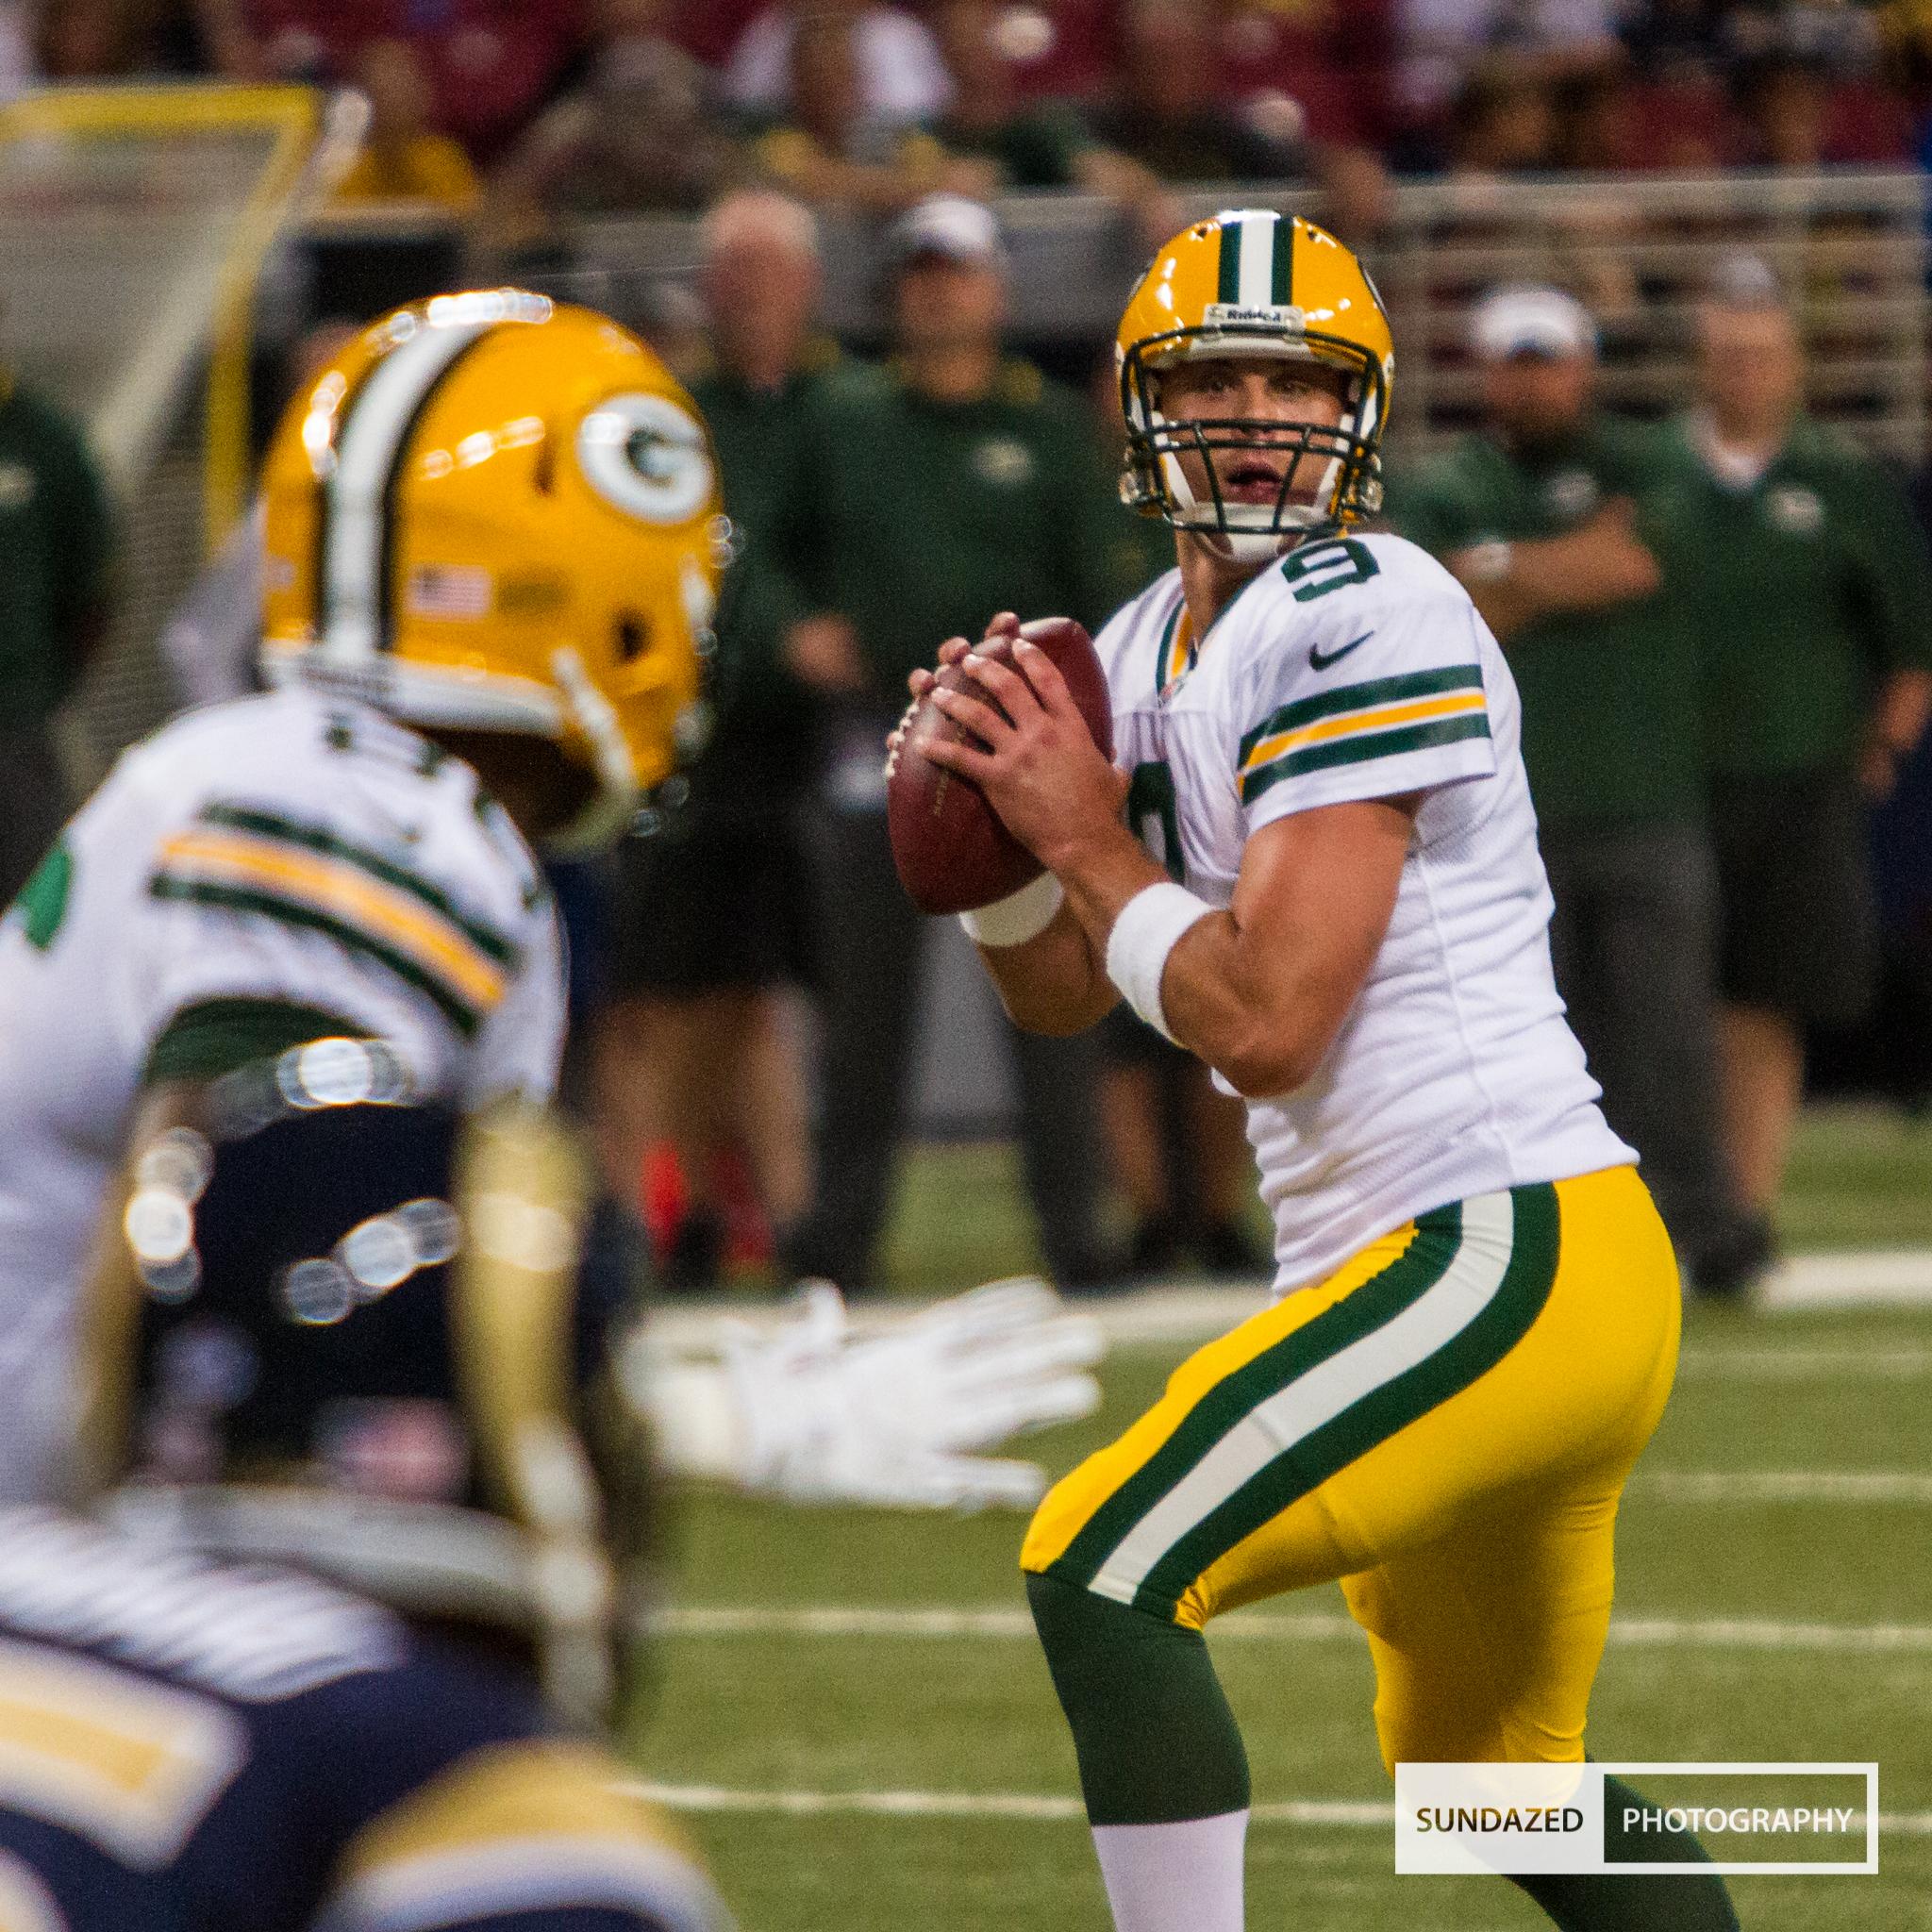 Sunday_NFL_STL_GB_0902.jpg